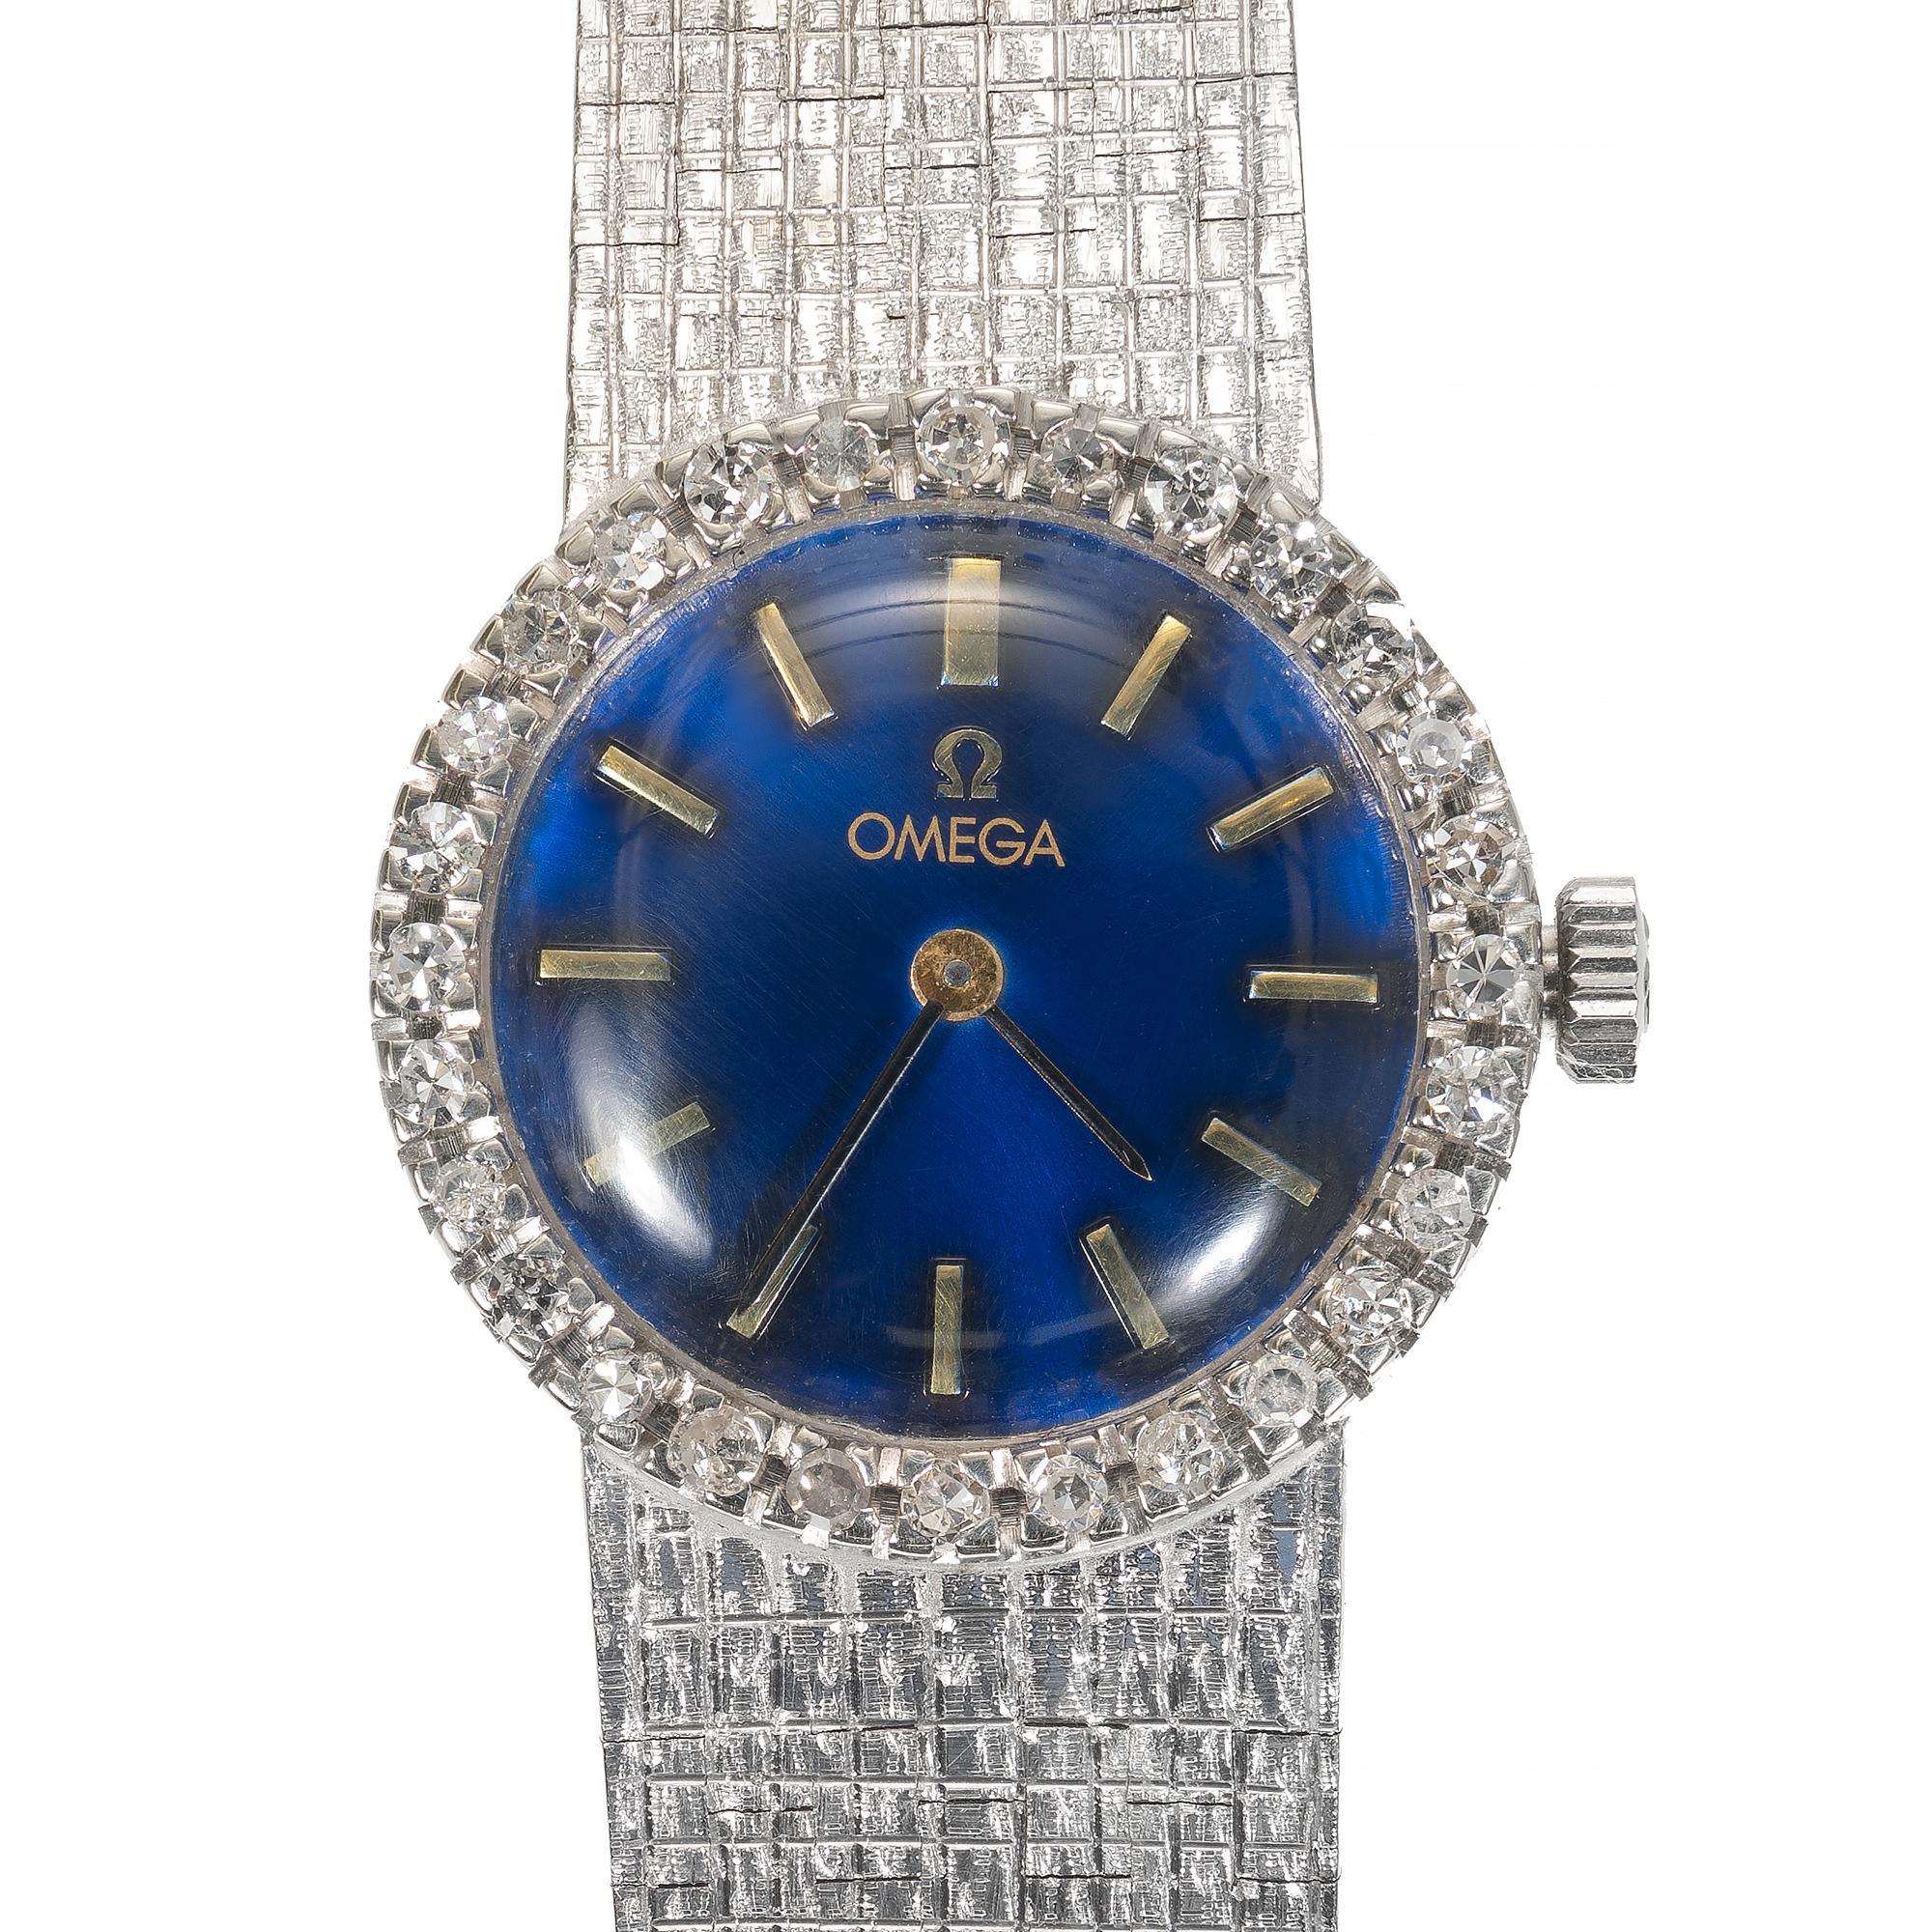 Omega Ladies Diamond Bezel White Gold Wristwatch